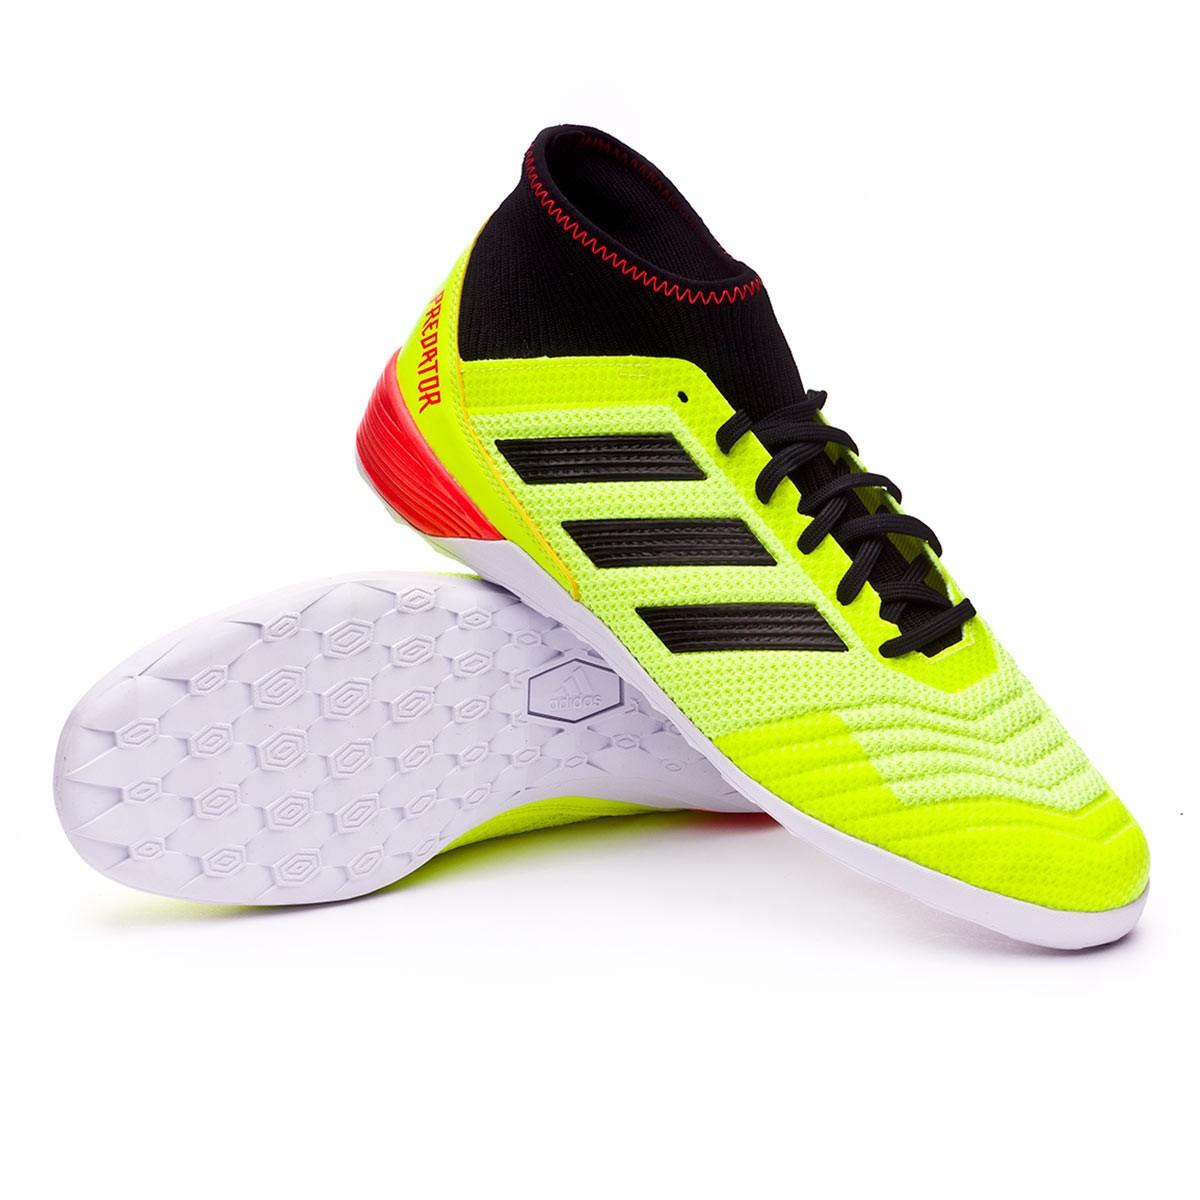 91b1fedd56e4 Futsal Boot adidas Predator Tango 18.3 IN Solar yellow-Black-Solar ...